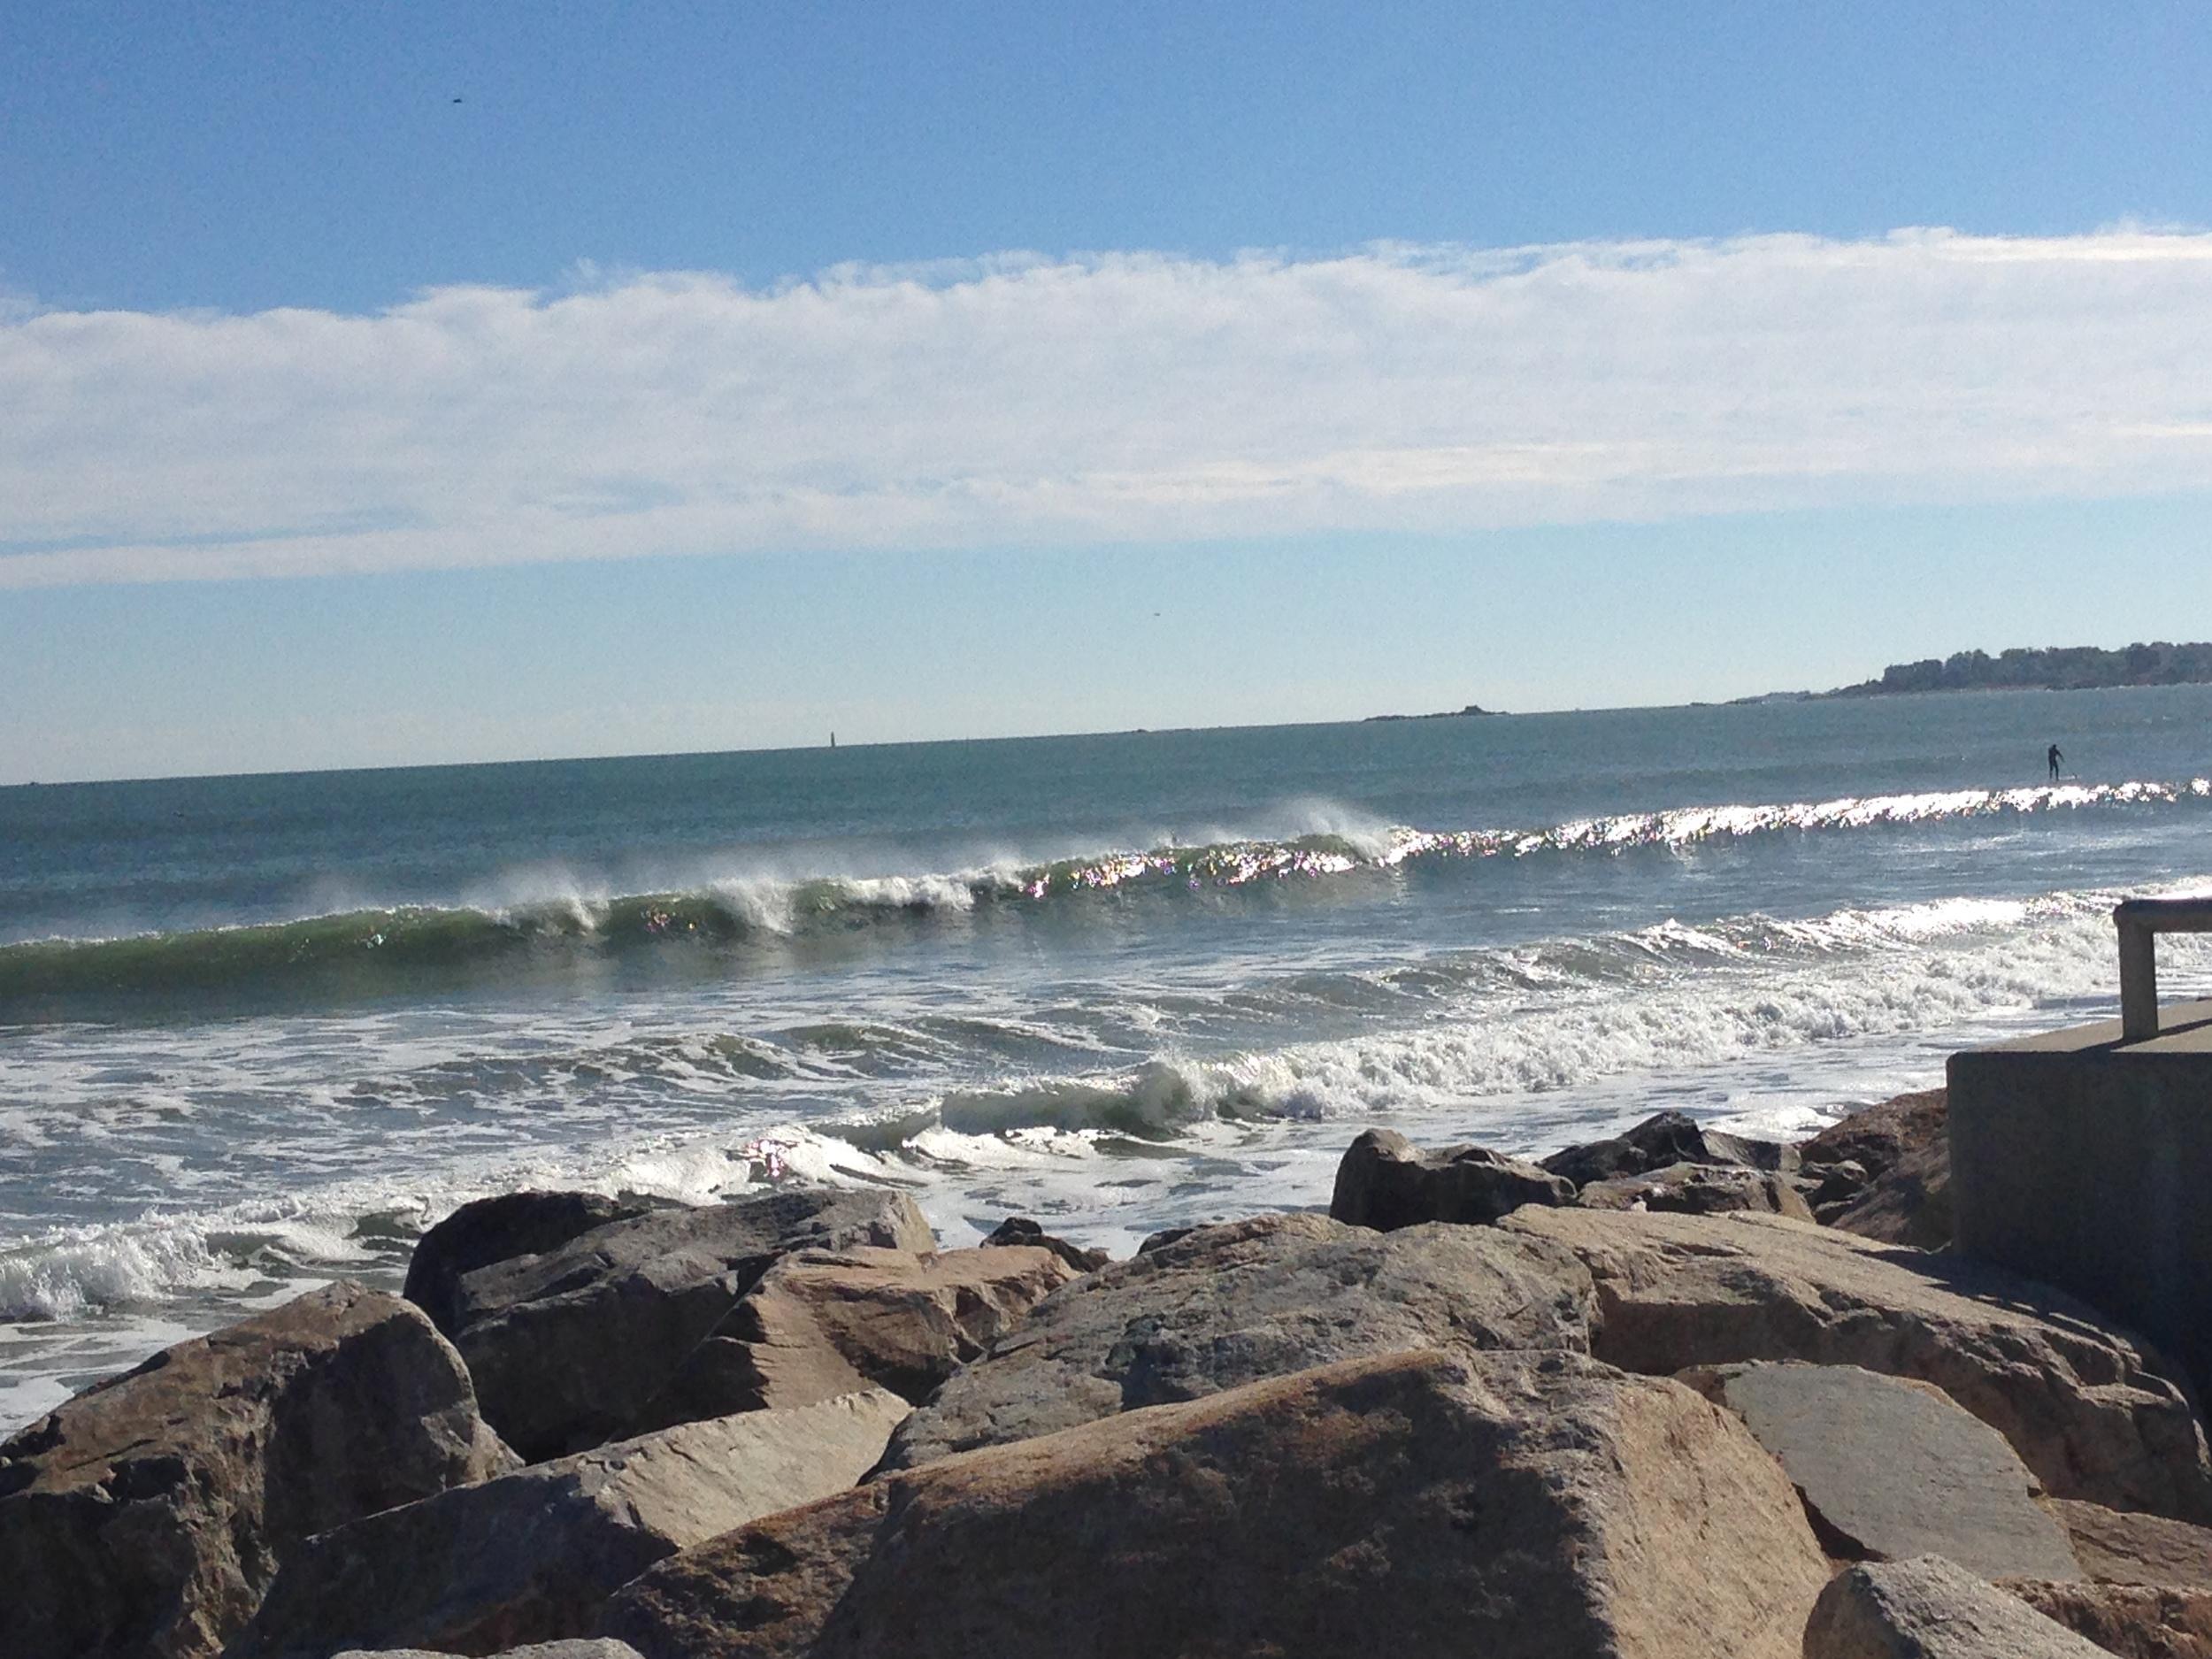 Beautiful Nantasket Beach ... Photo Credit: me